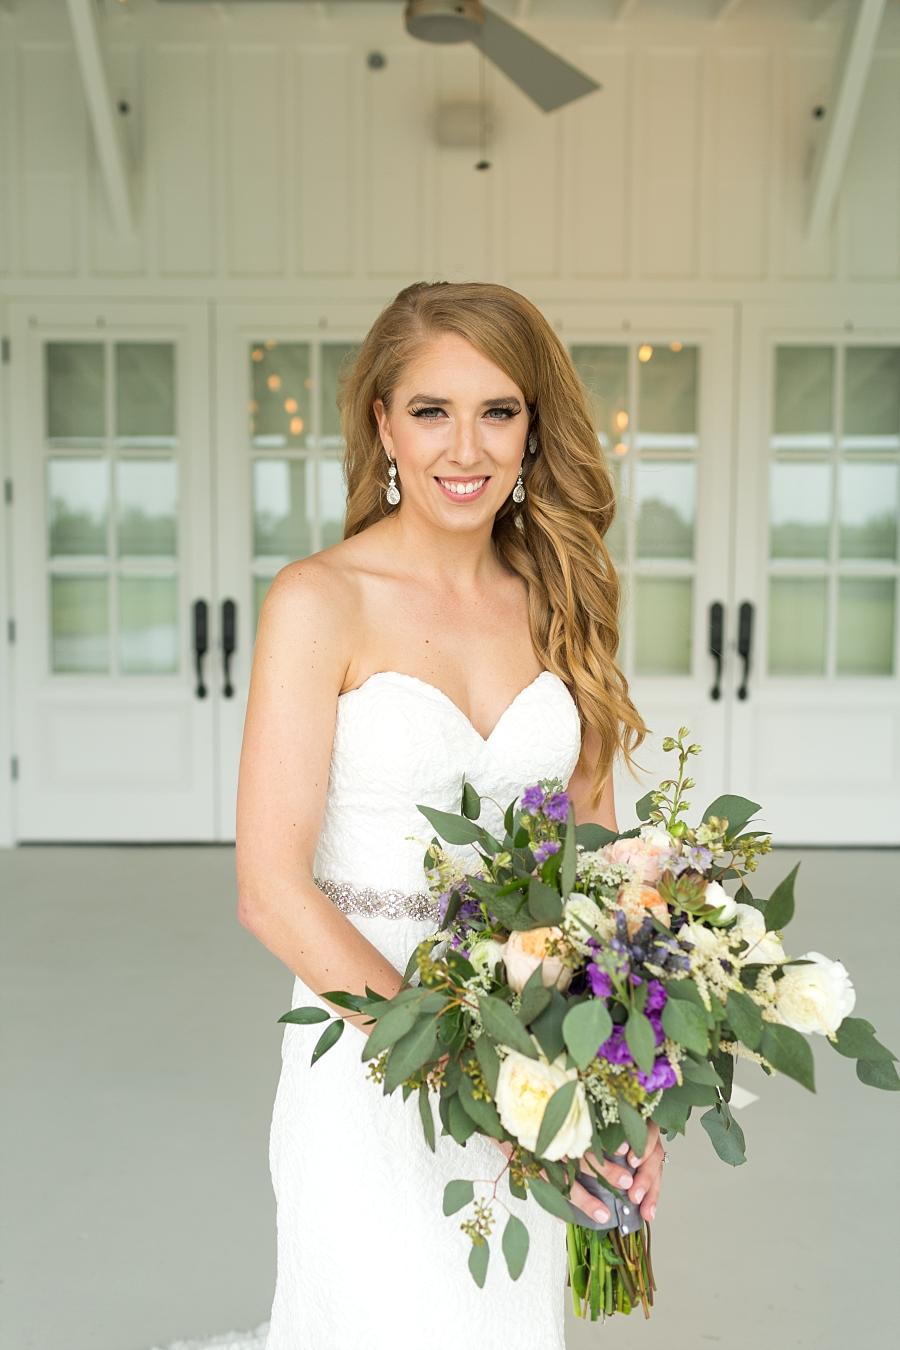 Stacy-Anderson-Photography-The-Farmhouse-Houston-Wedding-Photographer_0091.jpg